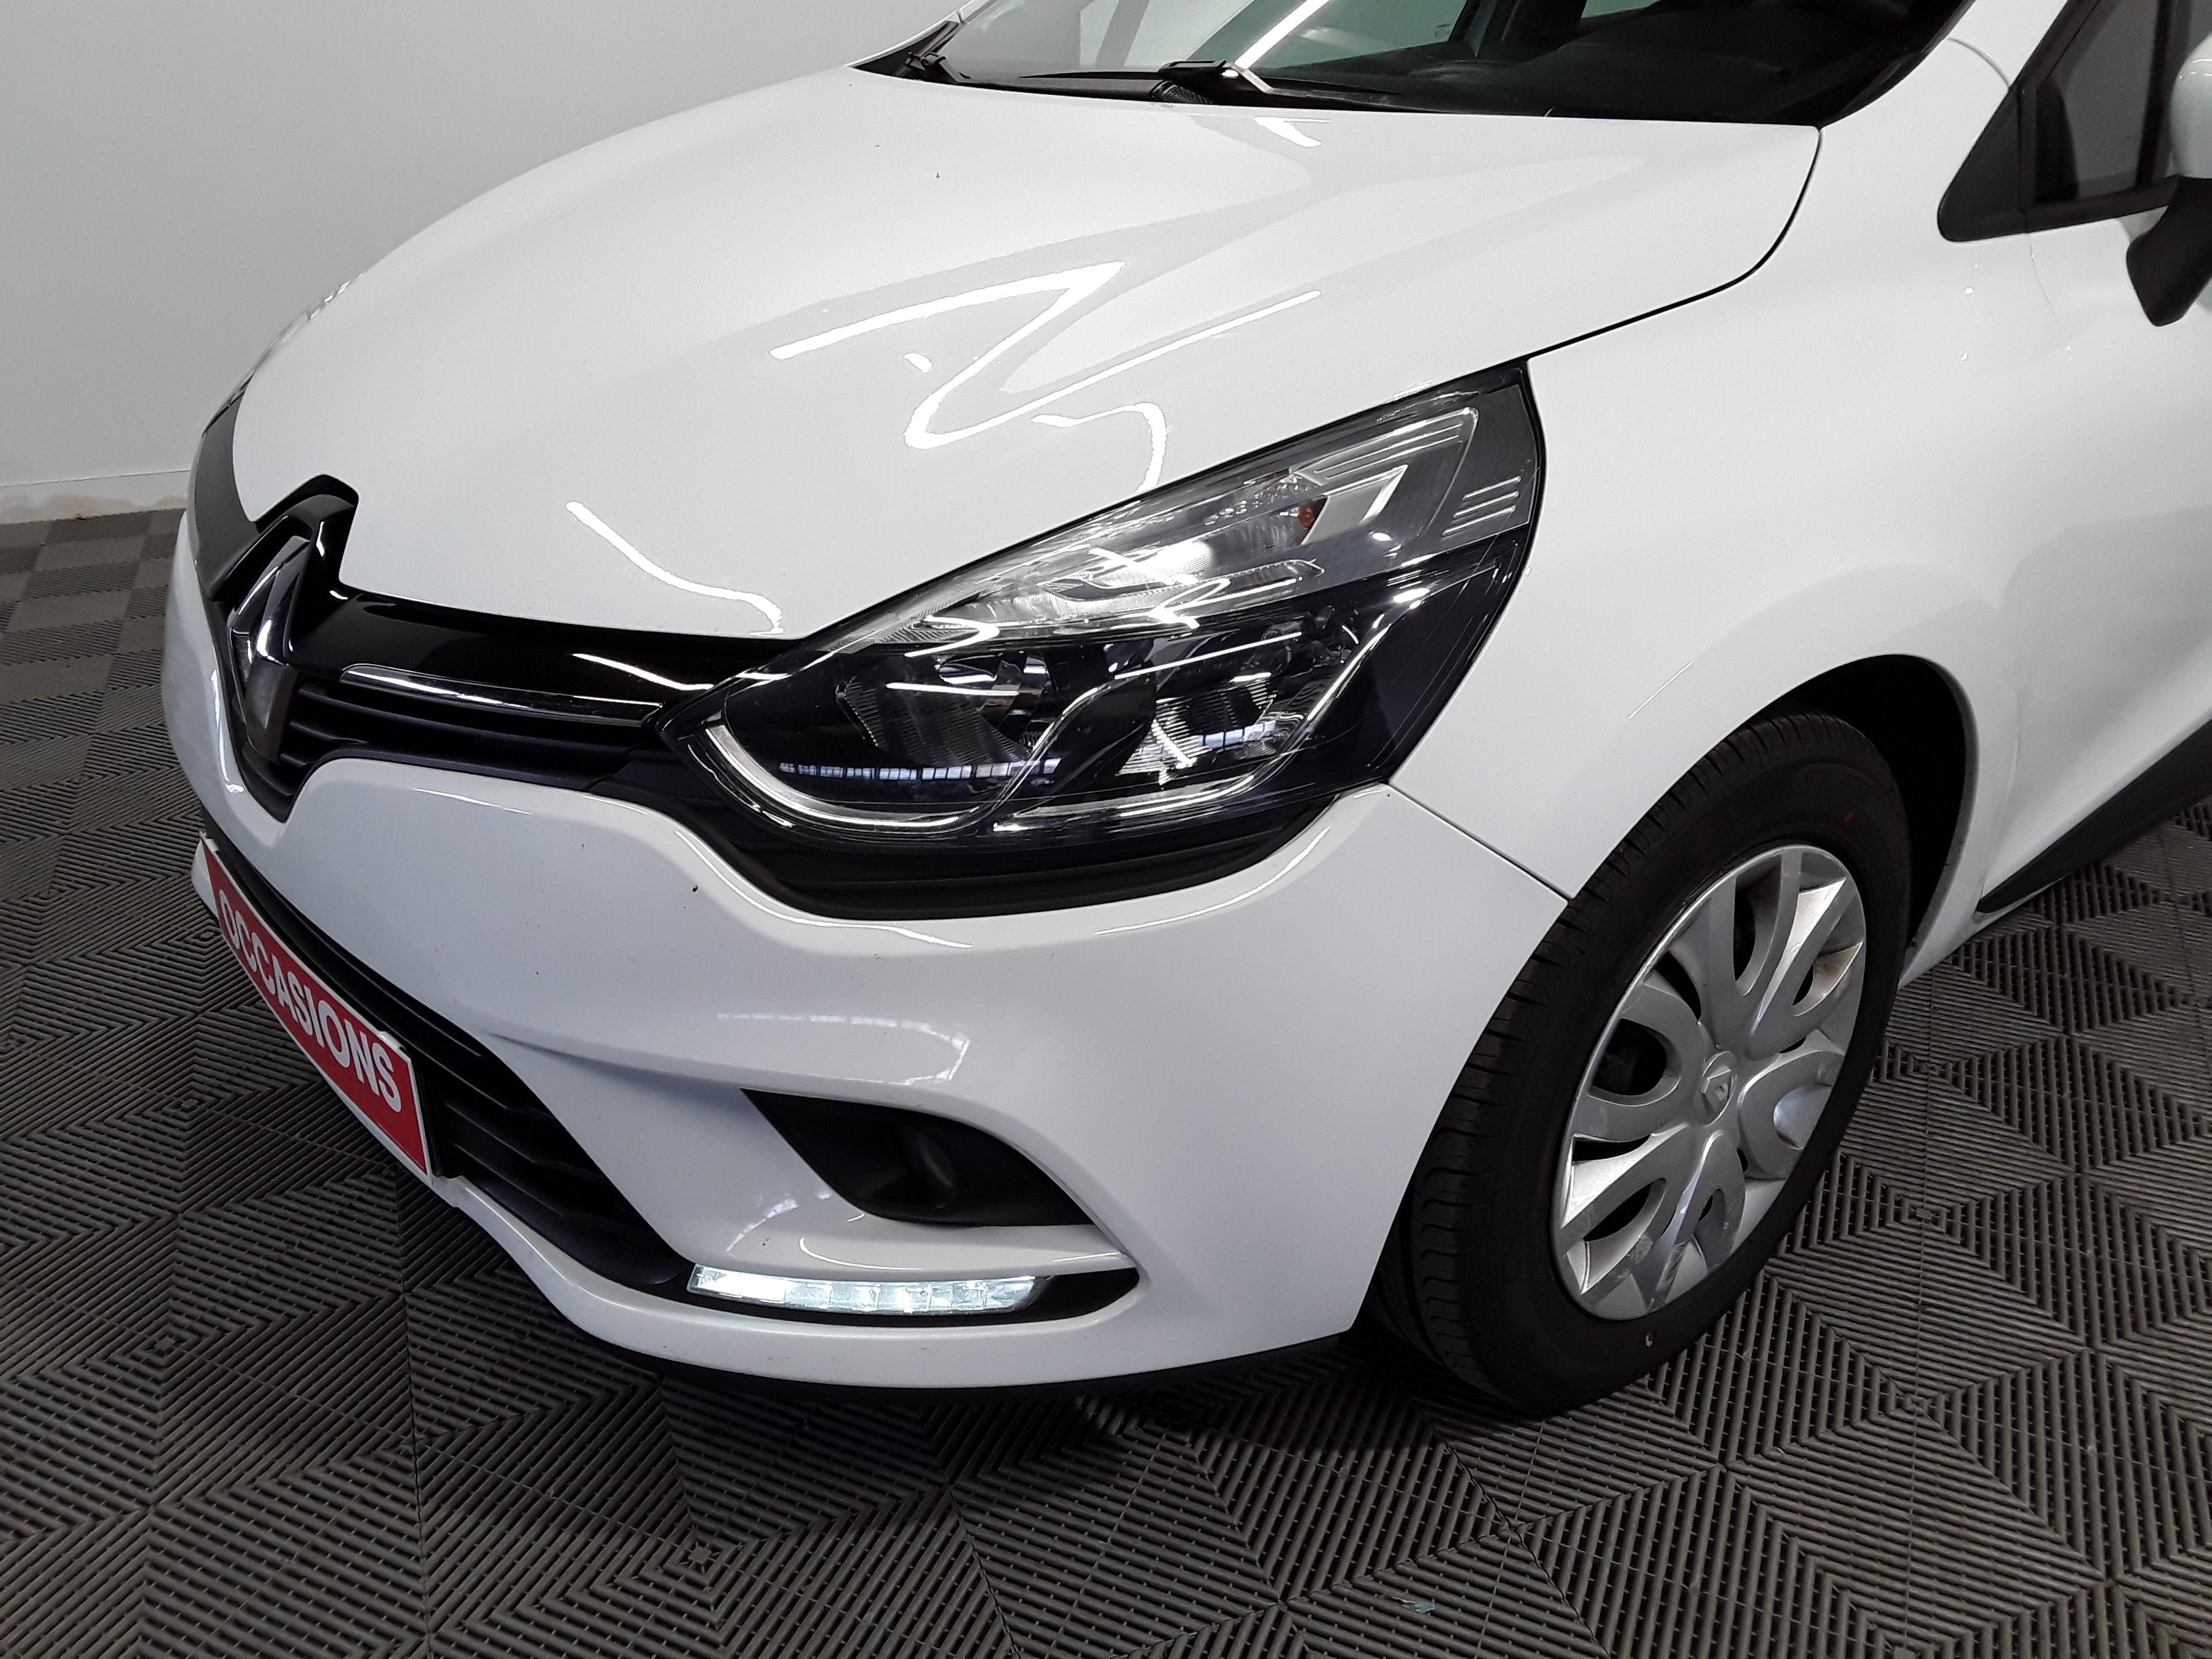 RENAULT CLIO IV SOCIETE 2018 à 8900 € - Photo n°3